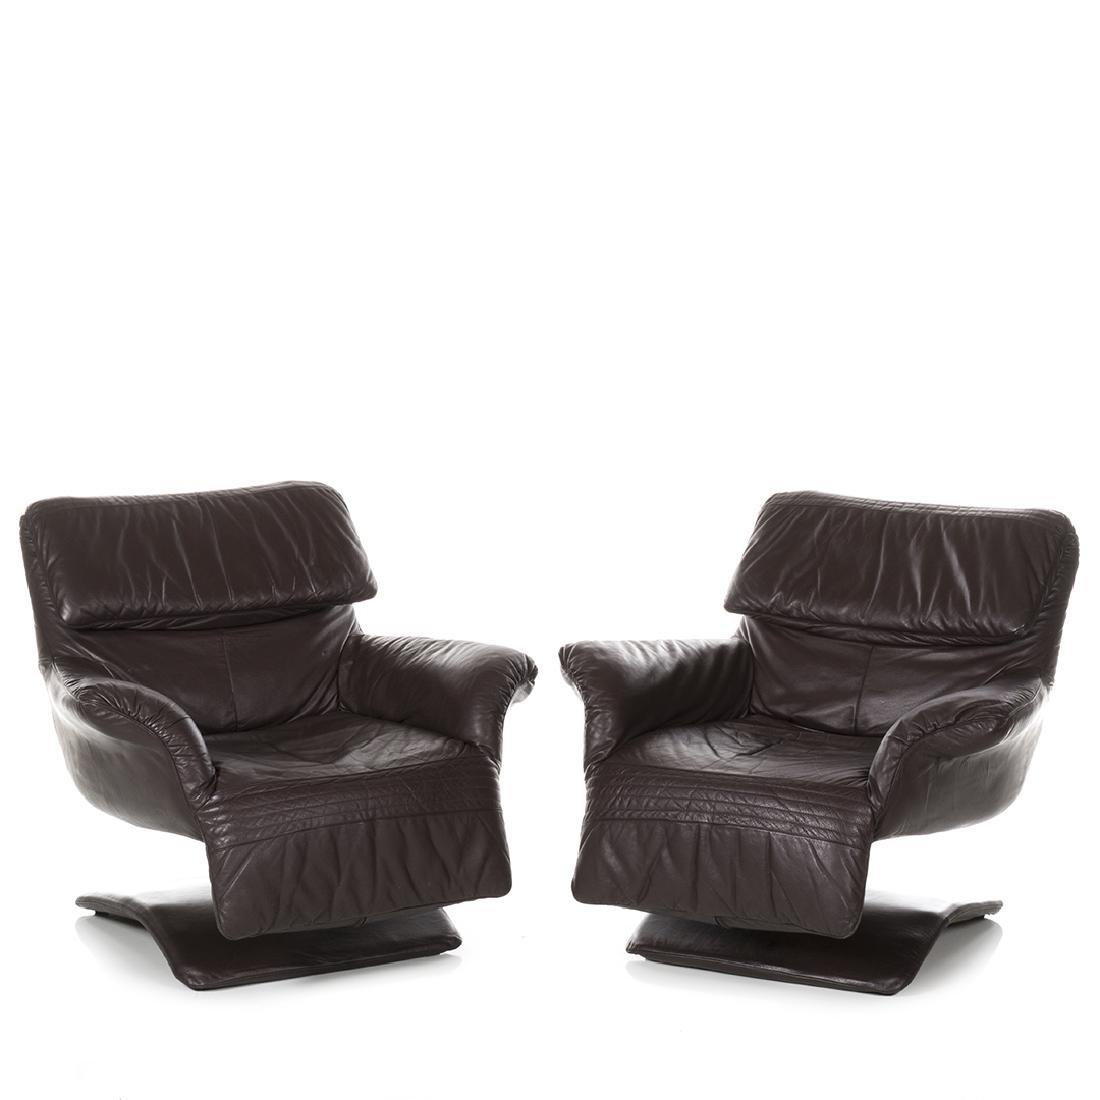 Scandinavian Leather Club Chairs (2)